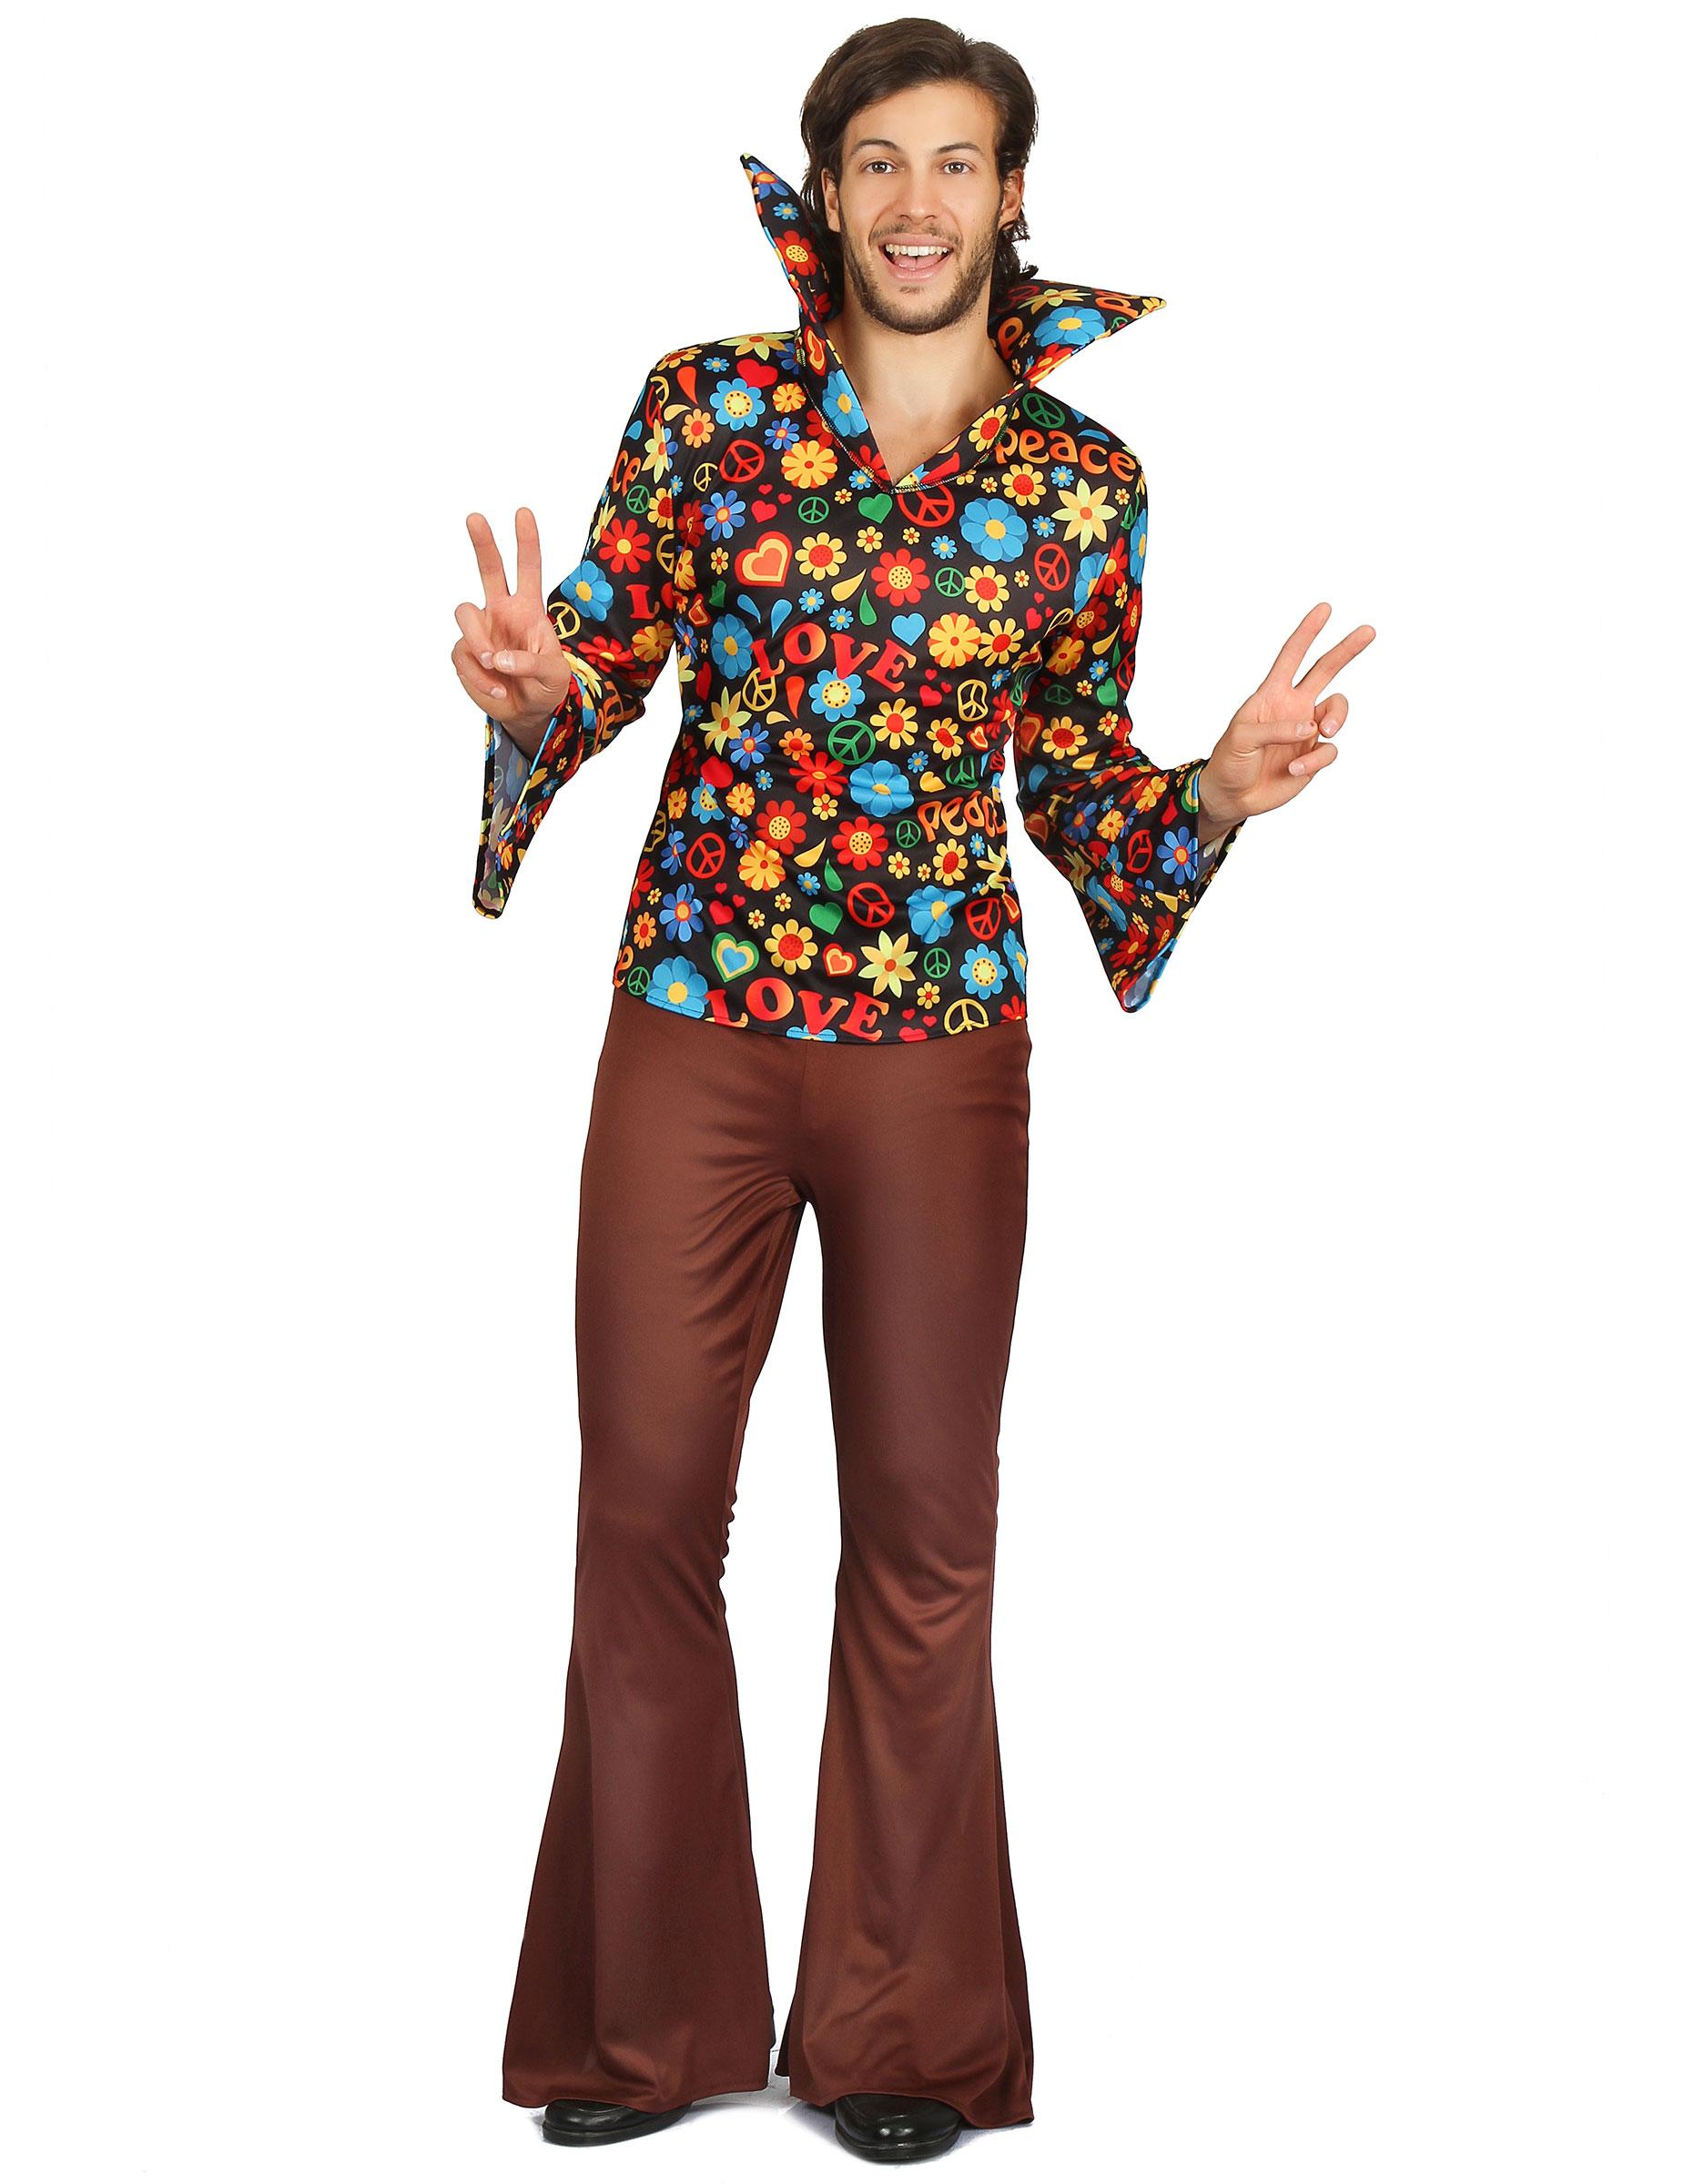 Travestimento da hippy pantaloni a zampa per uomo su VegaooParty ... 4fb77ccea9a